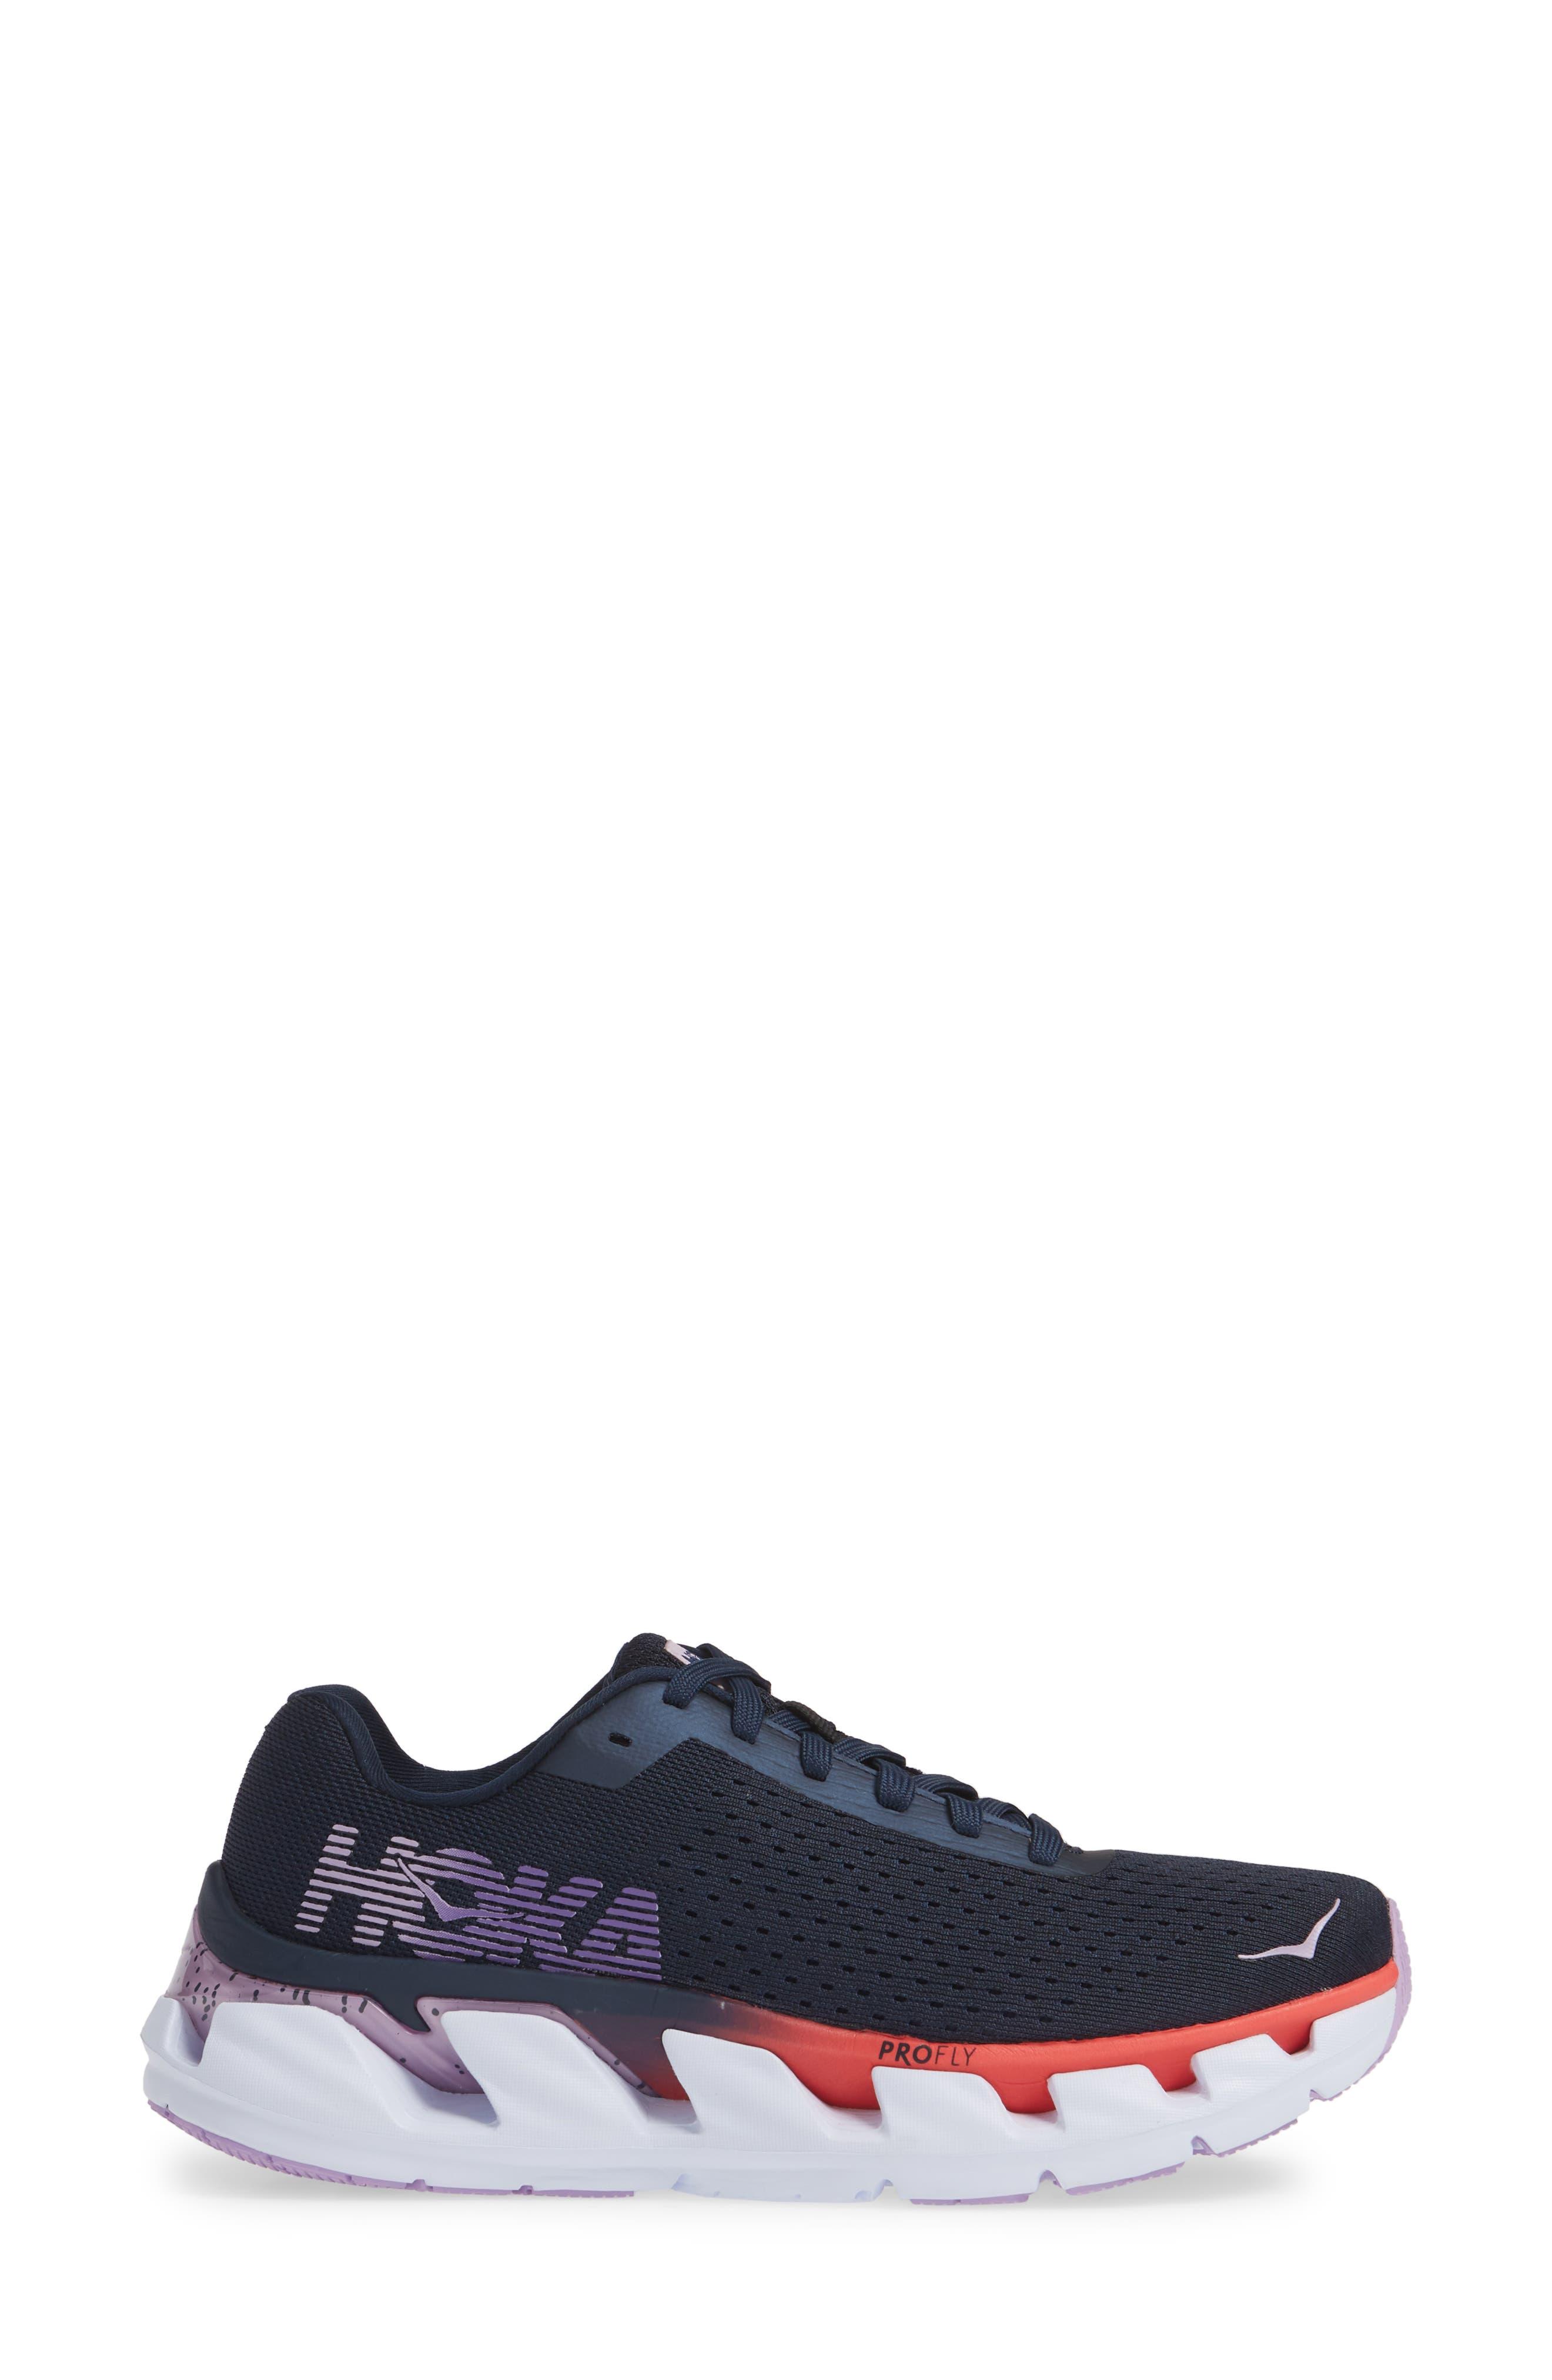 Elevon Running Shoe,                             Alternate thumbnail 3, color,                             001